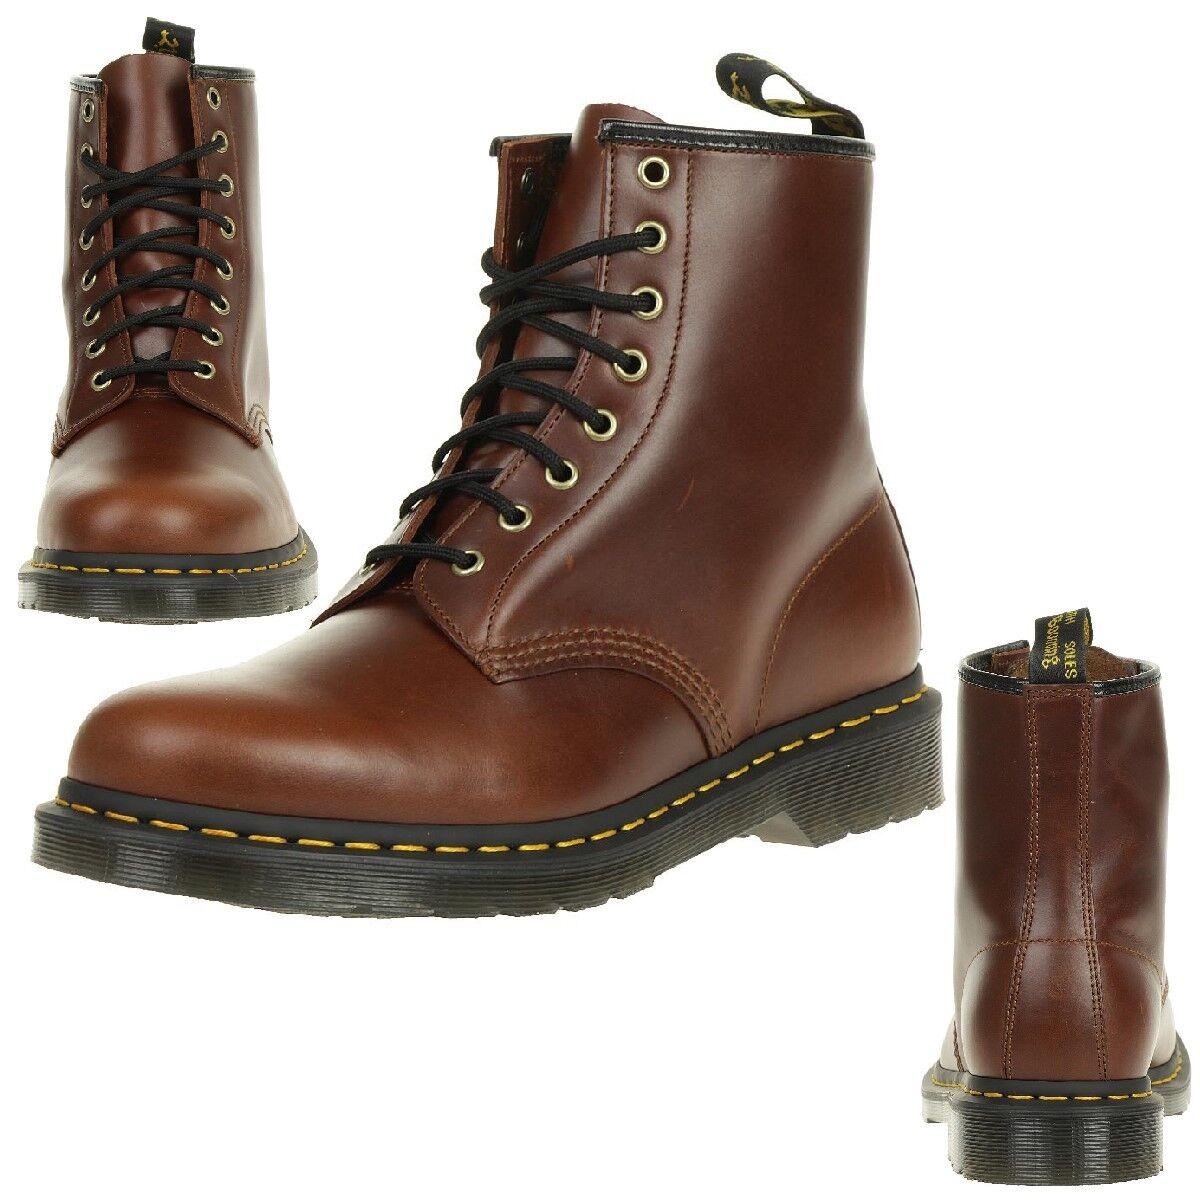 Dr. Martens 1460 Aqua Glide Cognac Unisex Stiefel Stiefel Braun 23878632    | Bevorzugtes Material